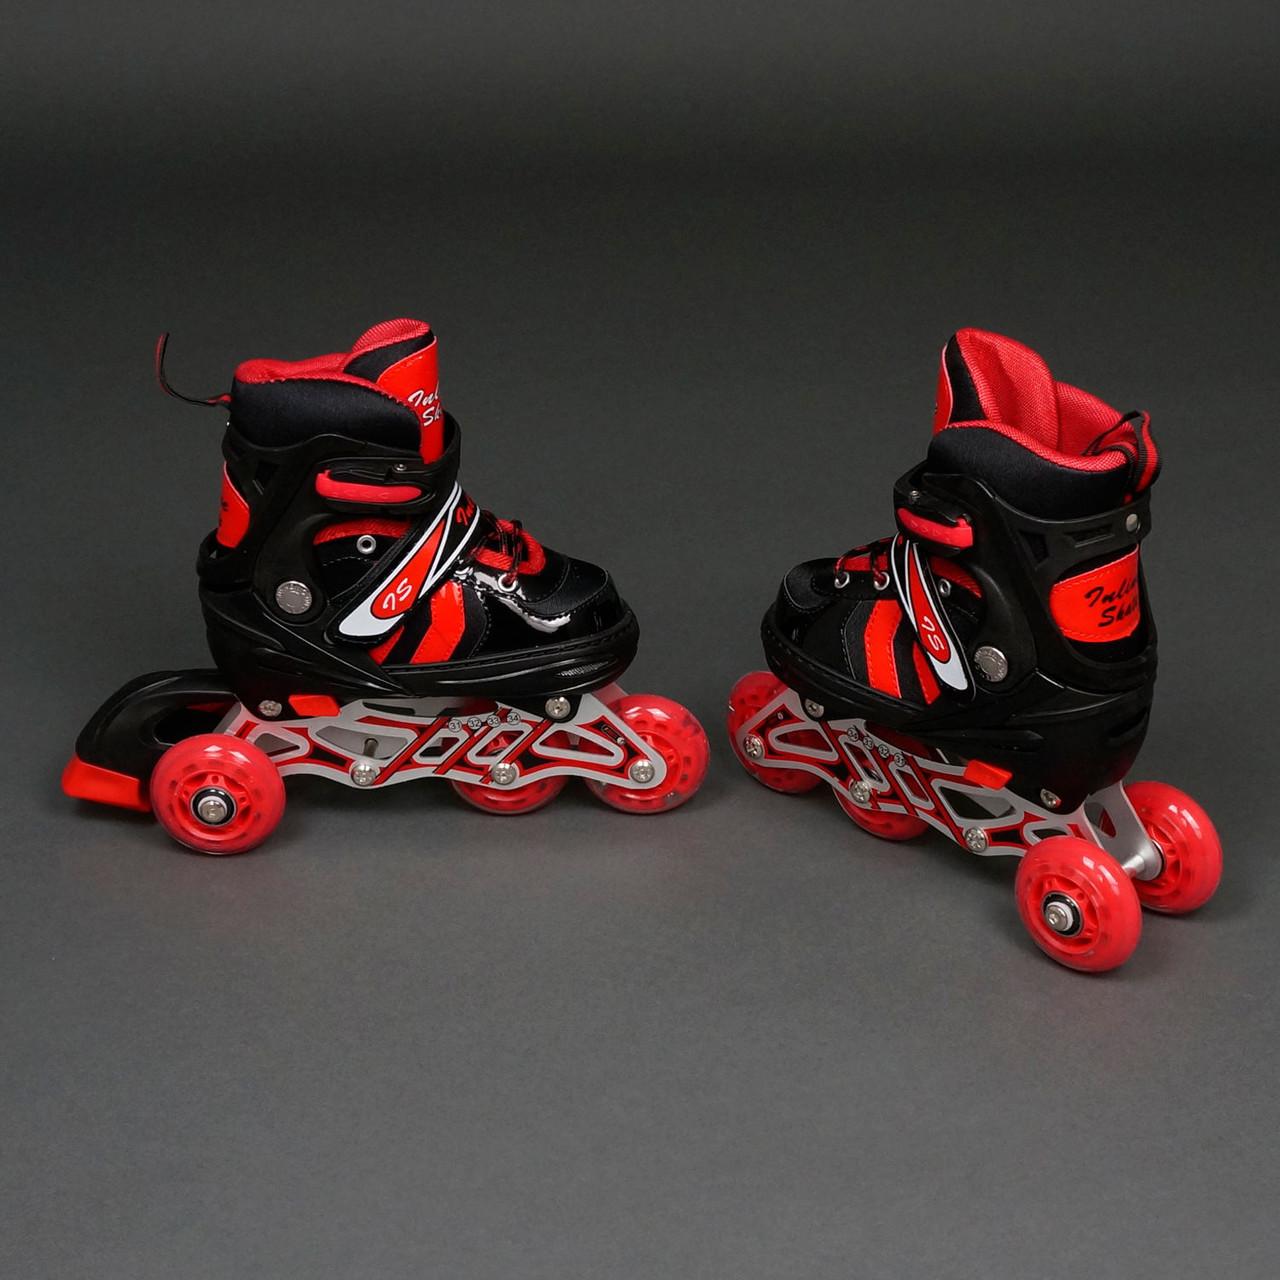 Ролики детские Best Rollers 9031